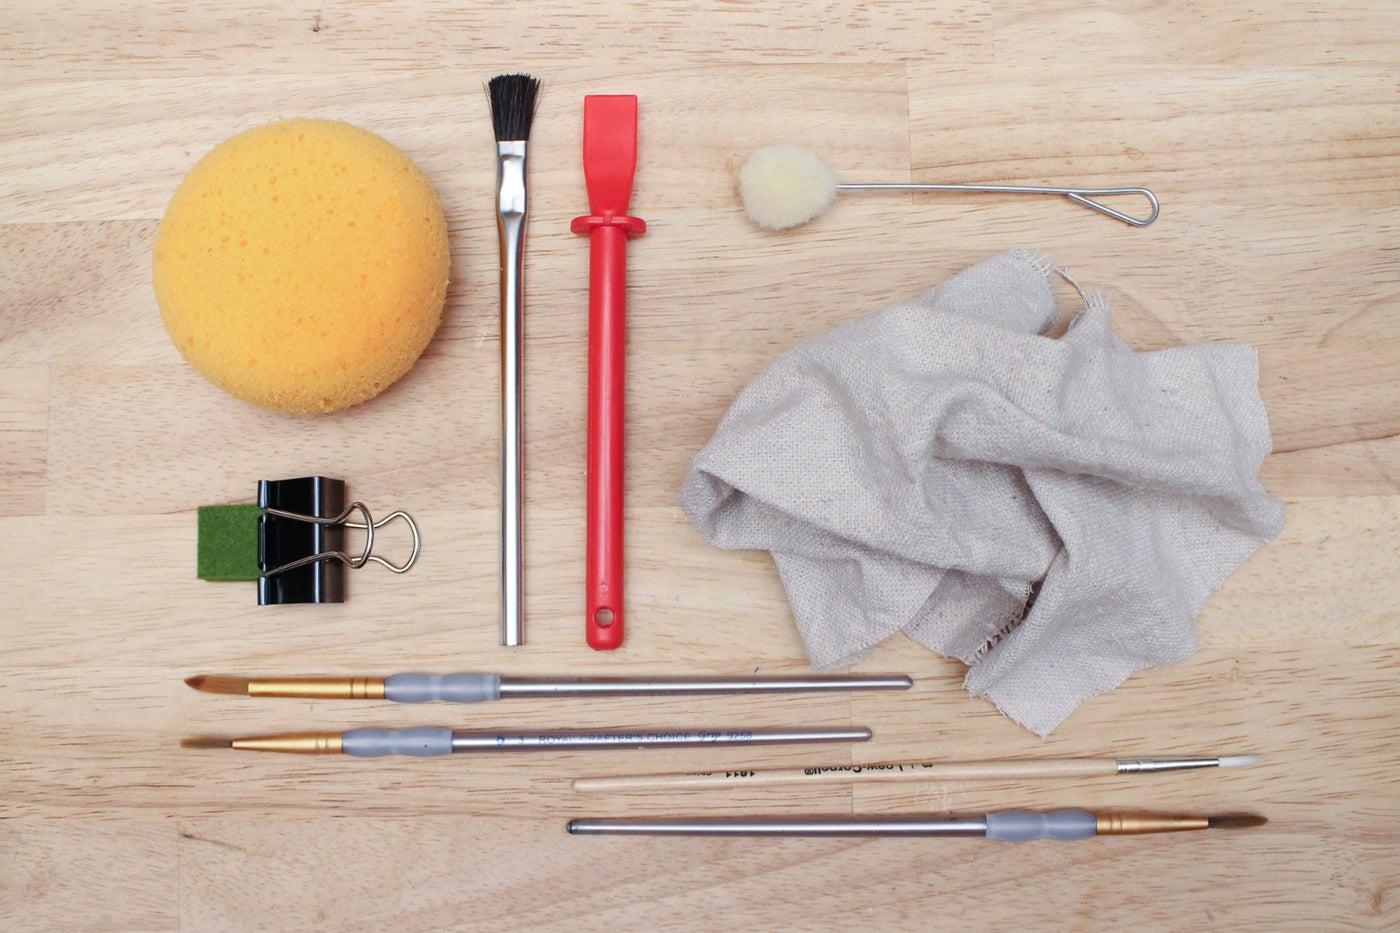 Brushes Sponges and Applicators